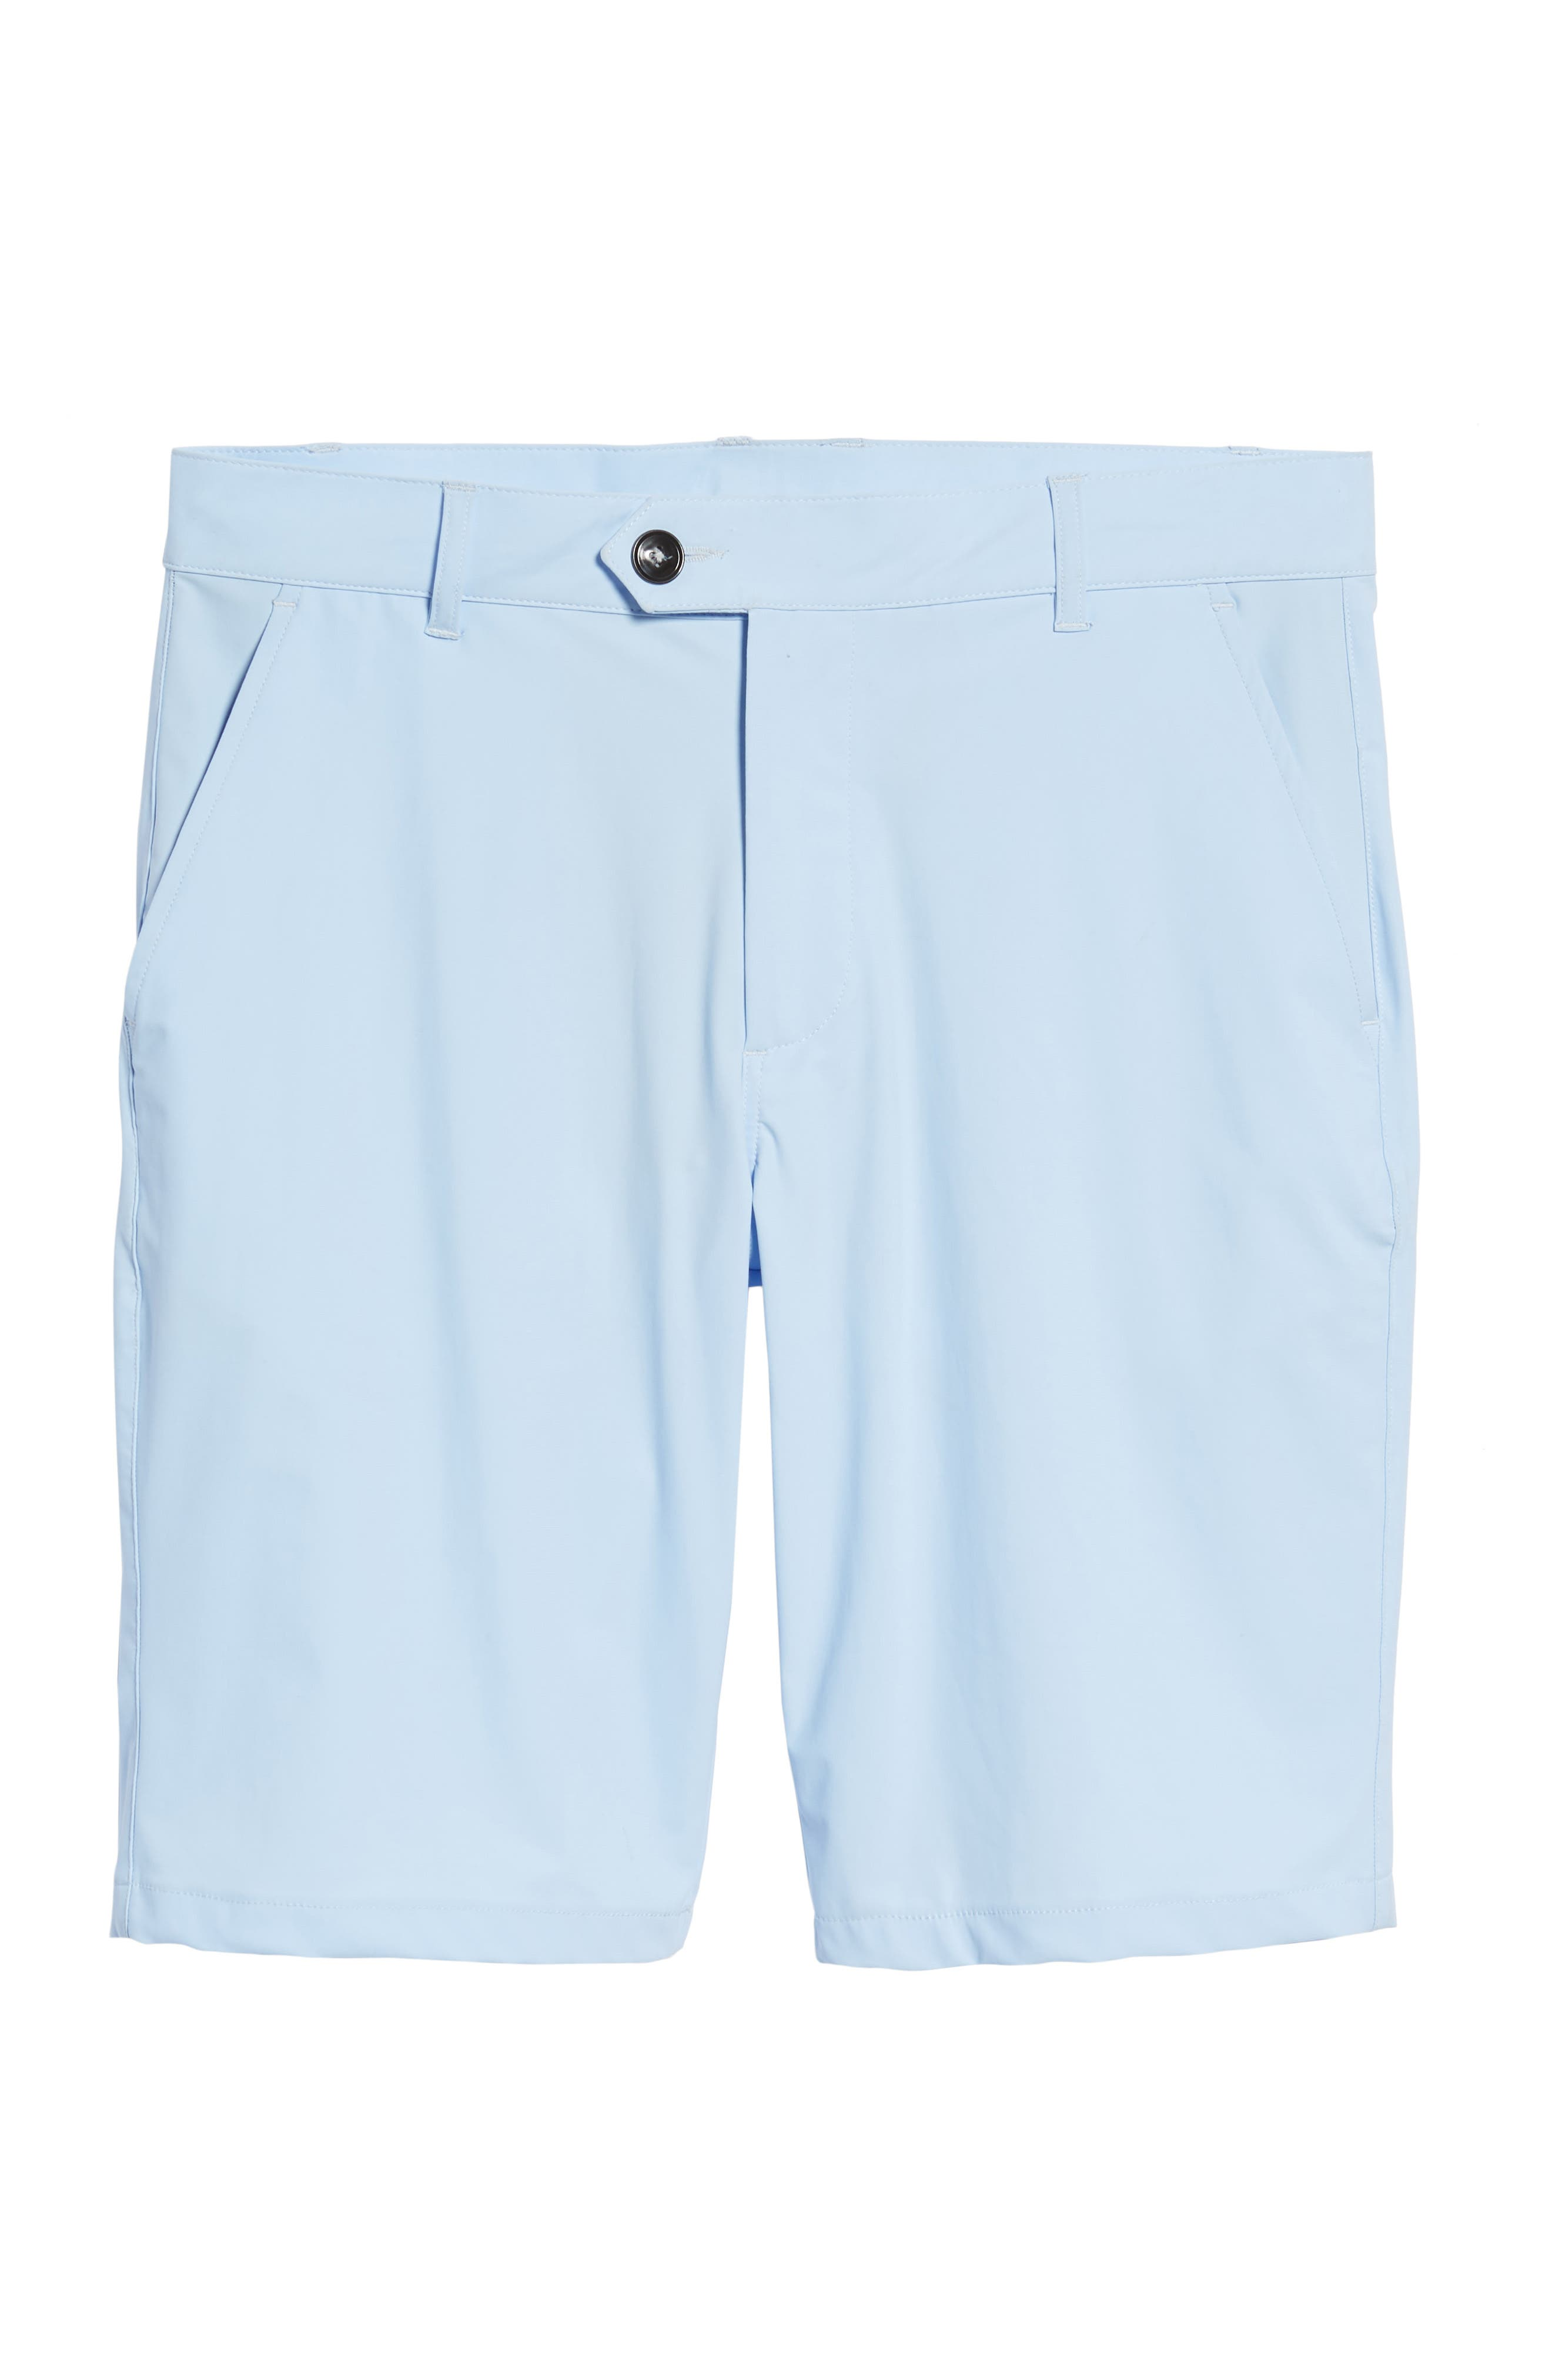 Montauk Shorts,                             Alternate thumbnail 6, color,                             WOLF